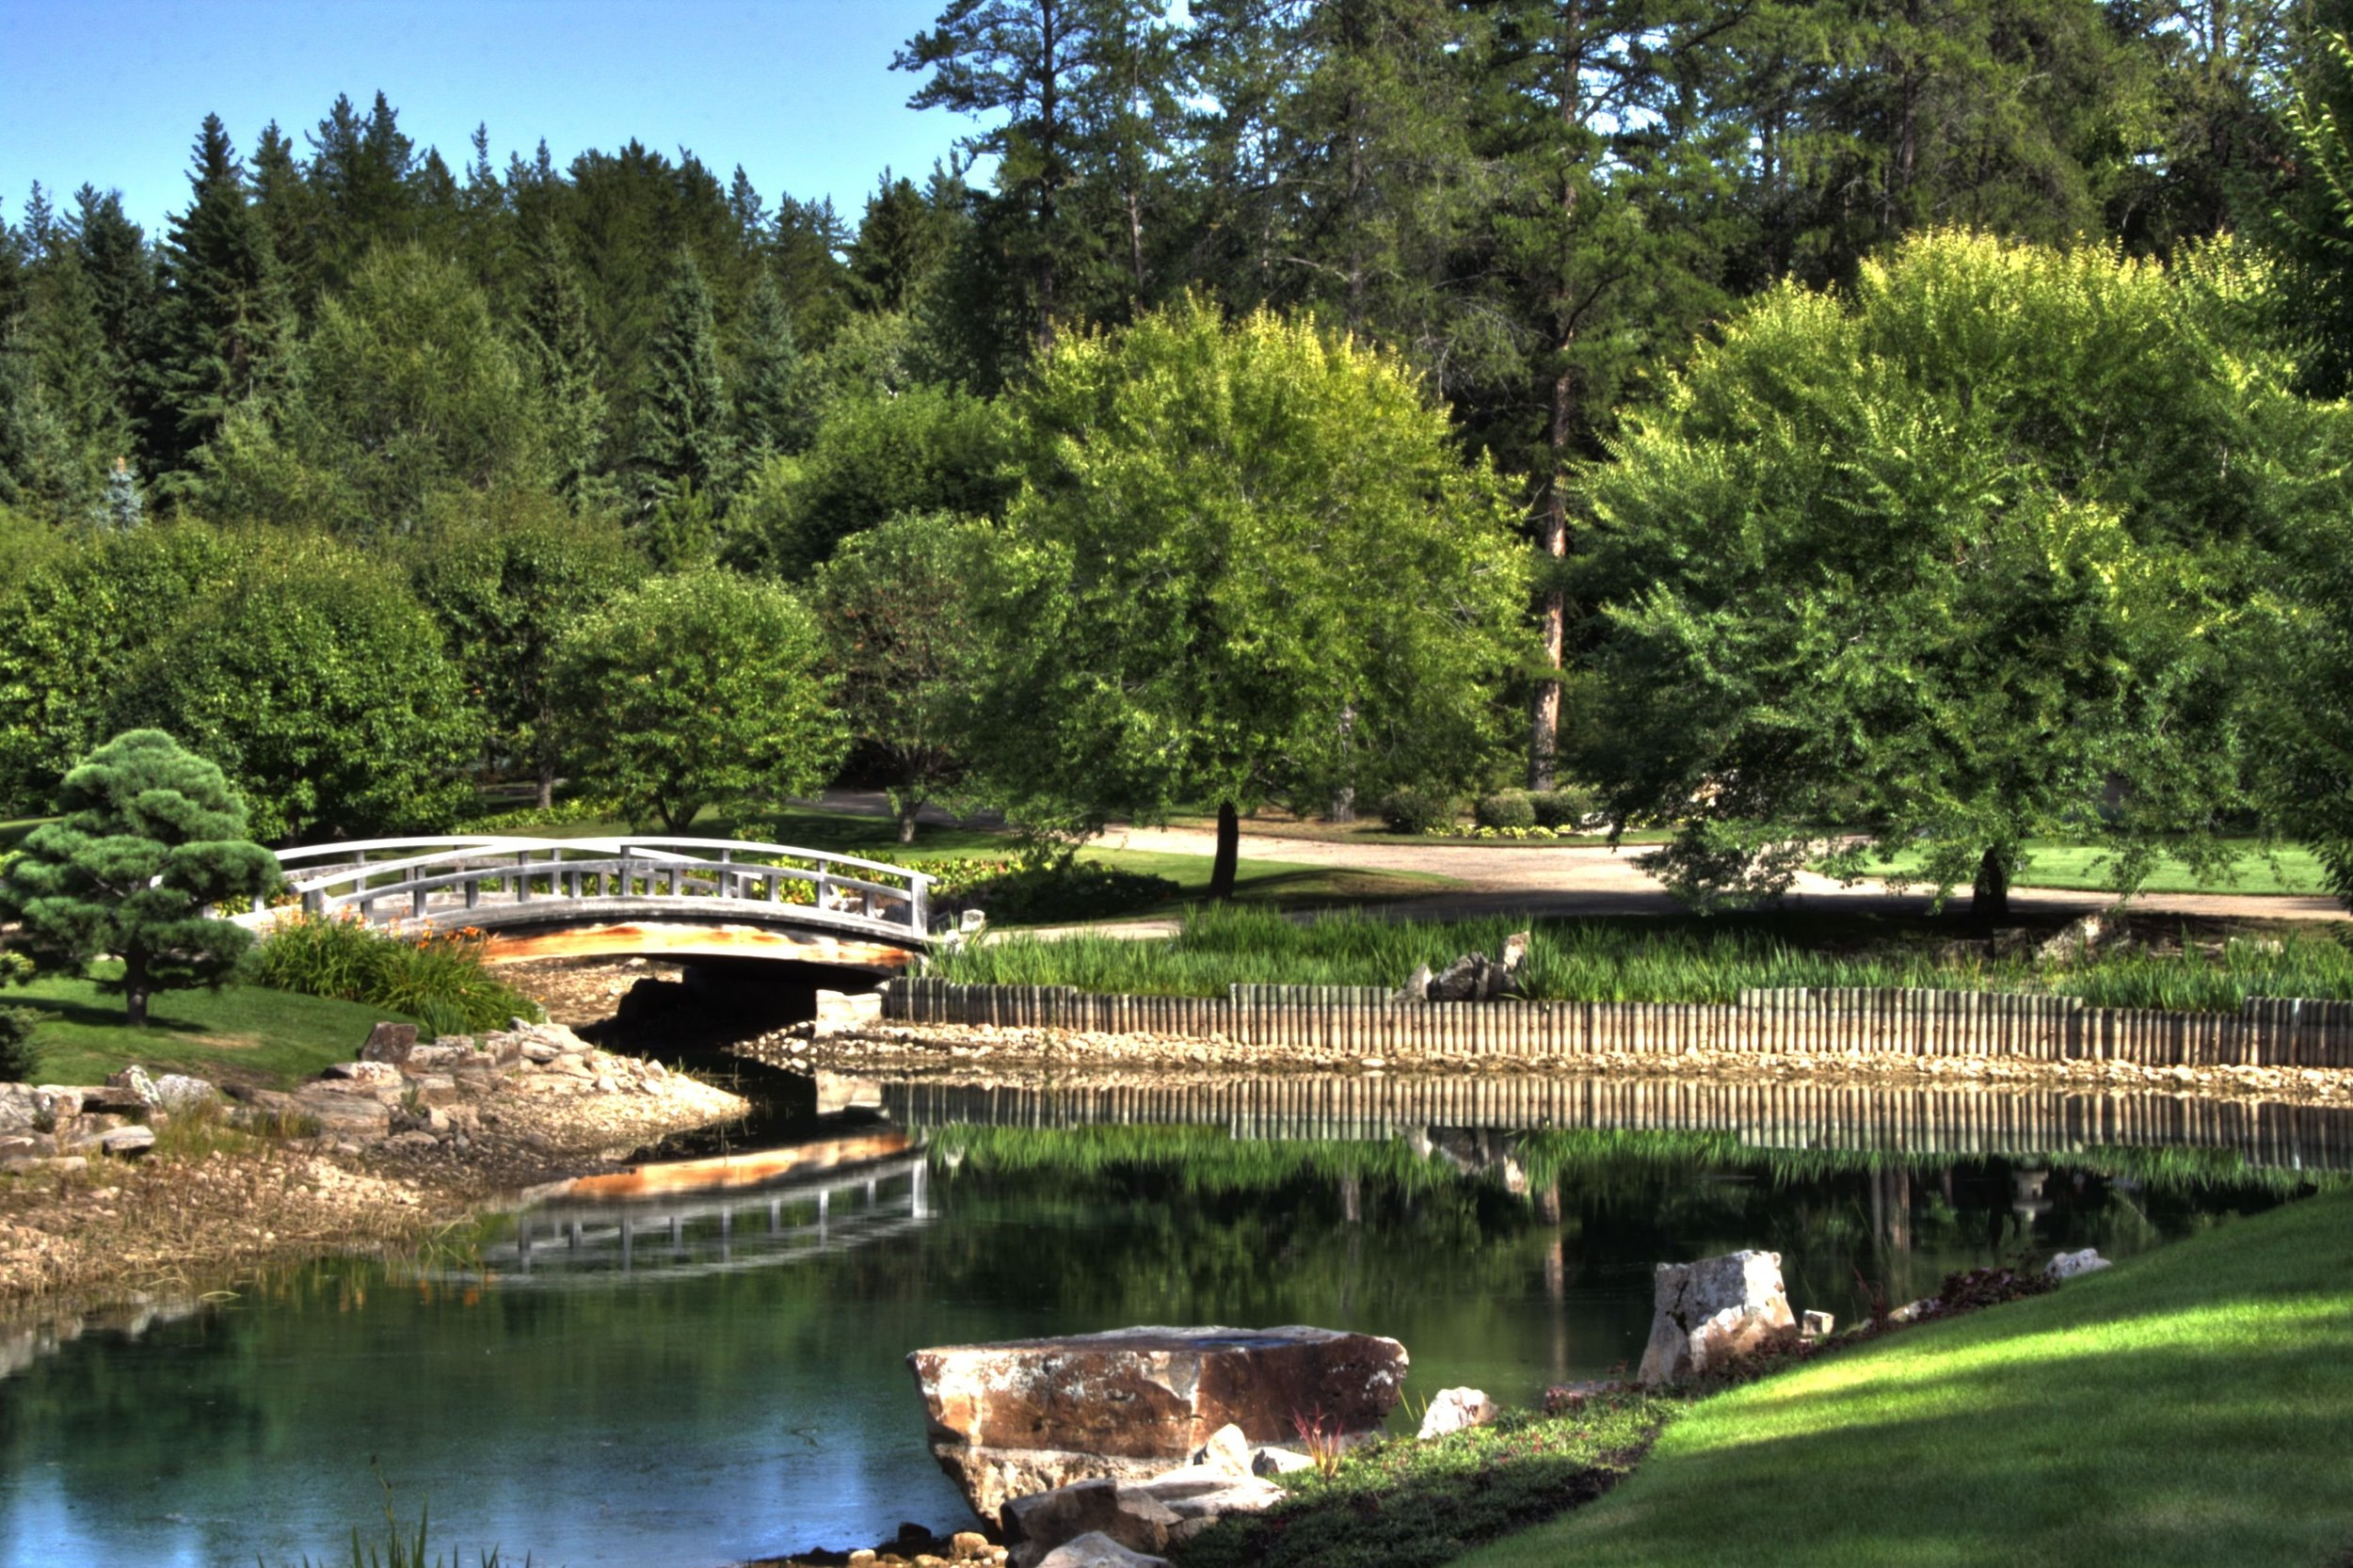 Japanese_Garden_Devonian_Botanic_Garden_Edmonton_Alberta_Canada_31A.jpg